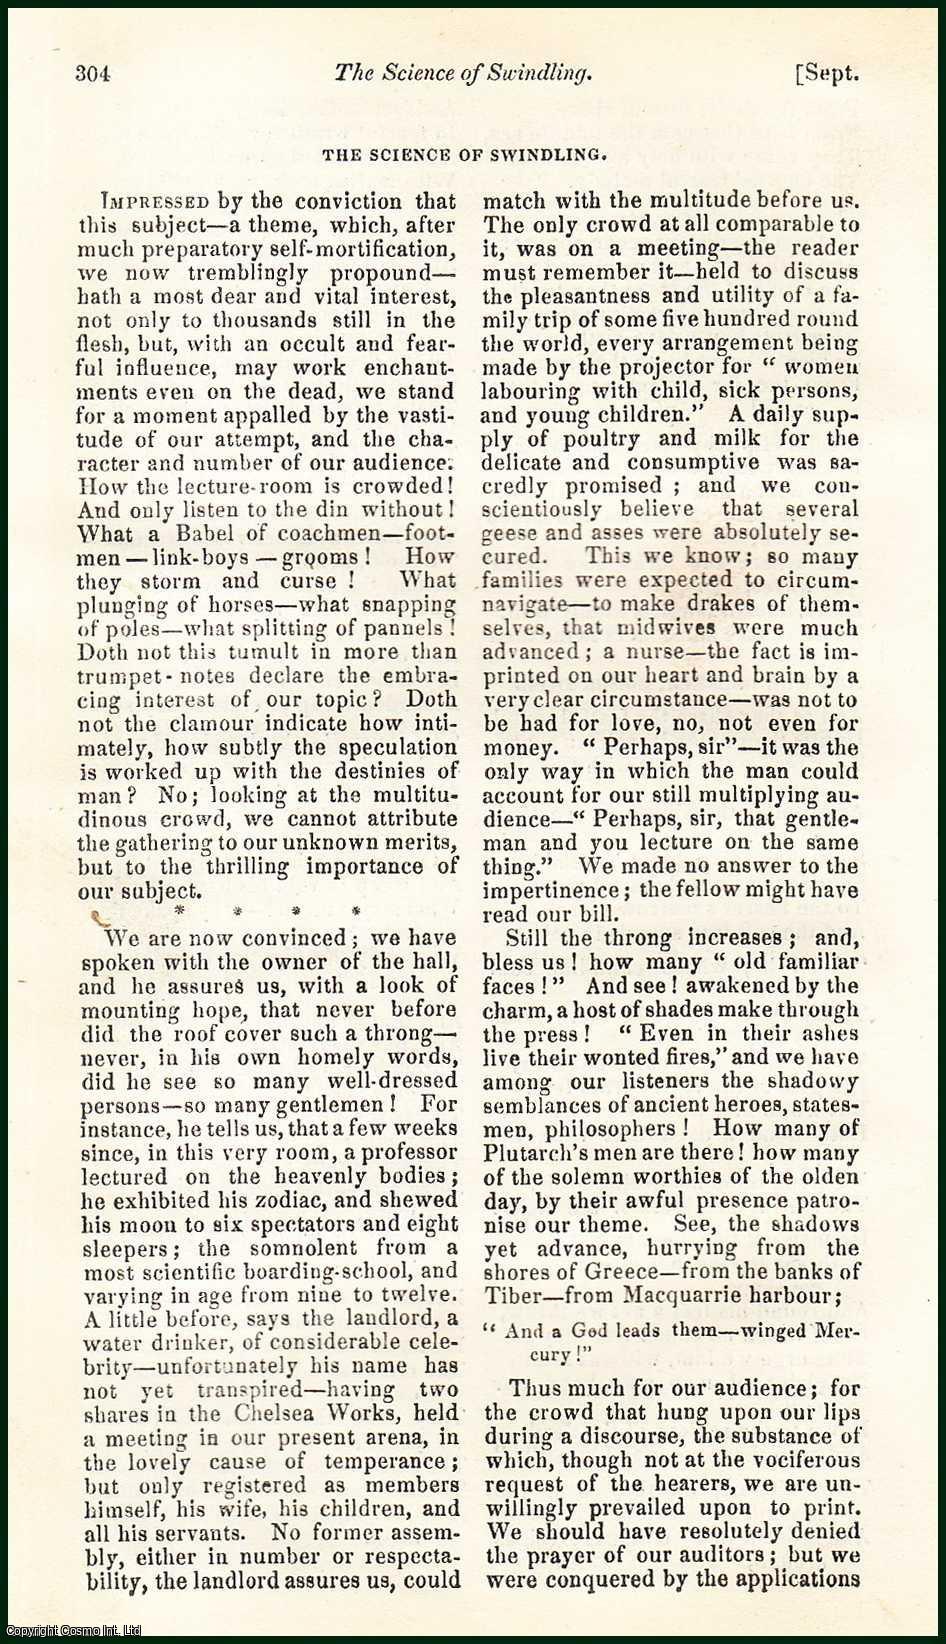 JERROLD, D.W. - The Science of Swindling: Political Satire. A rare original article from the Blackwood's Edinburgh Magazine, 1835.